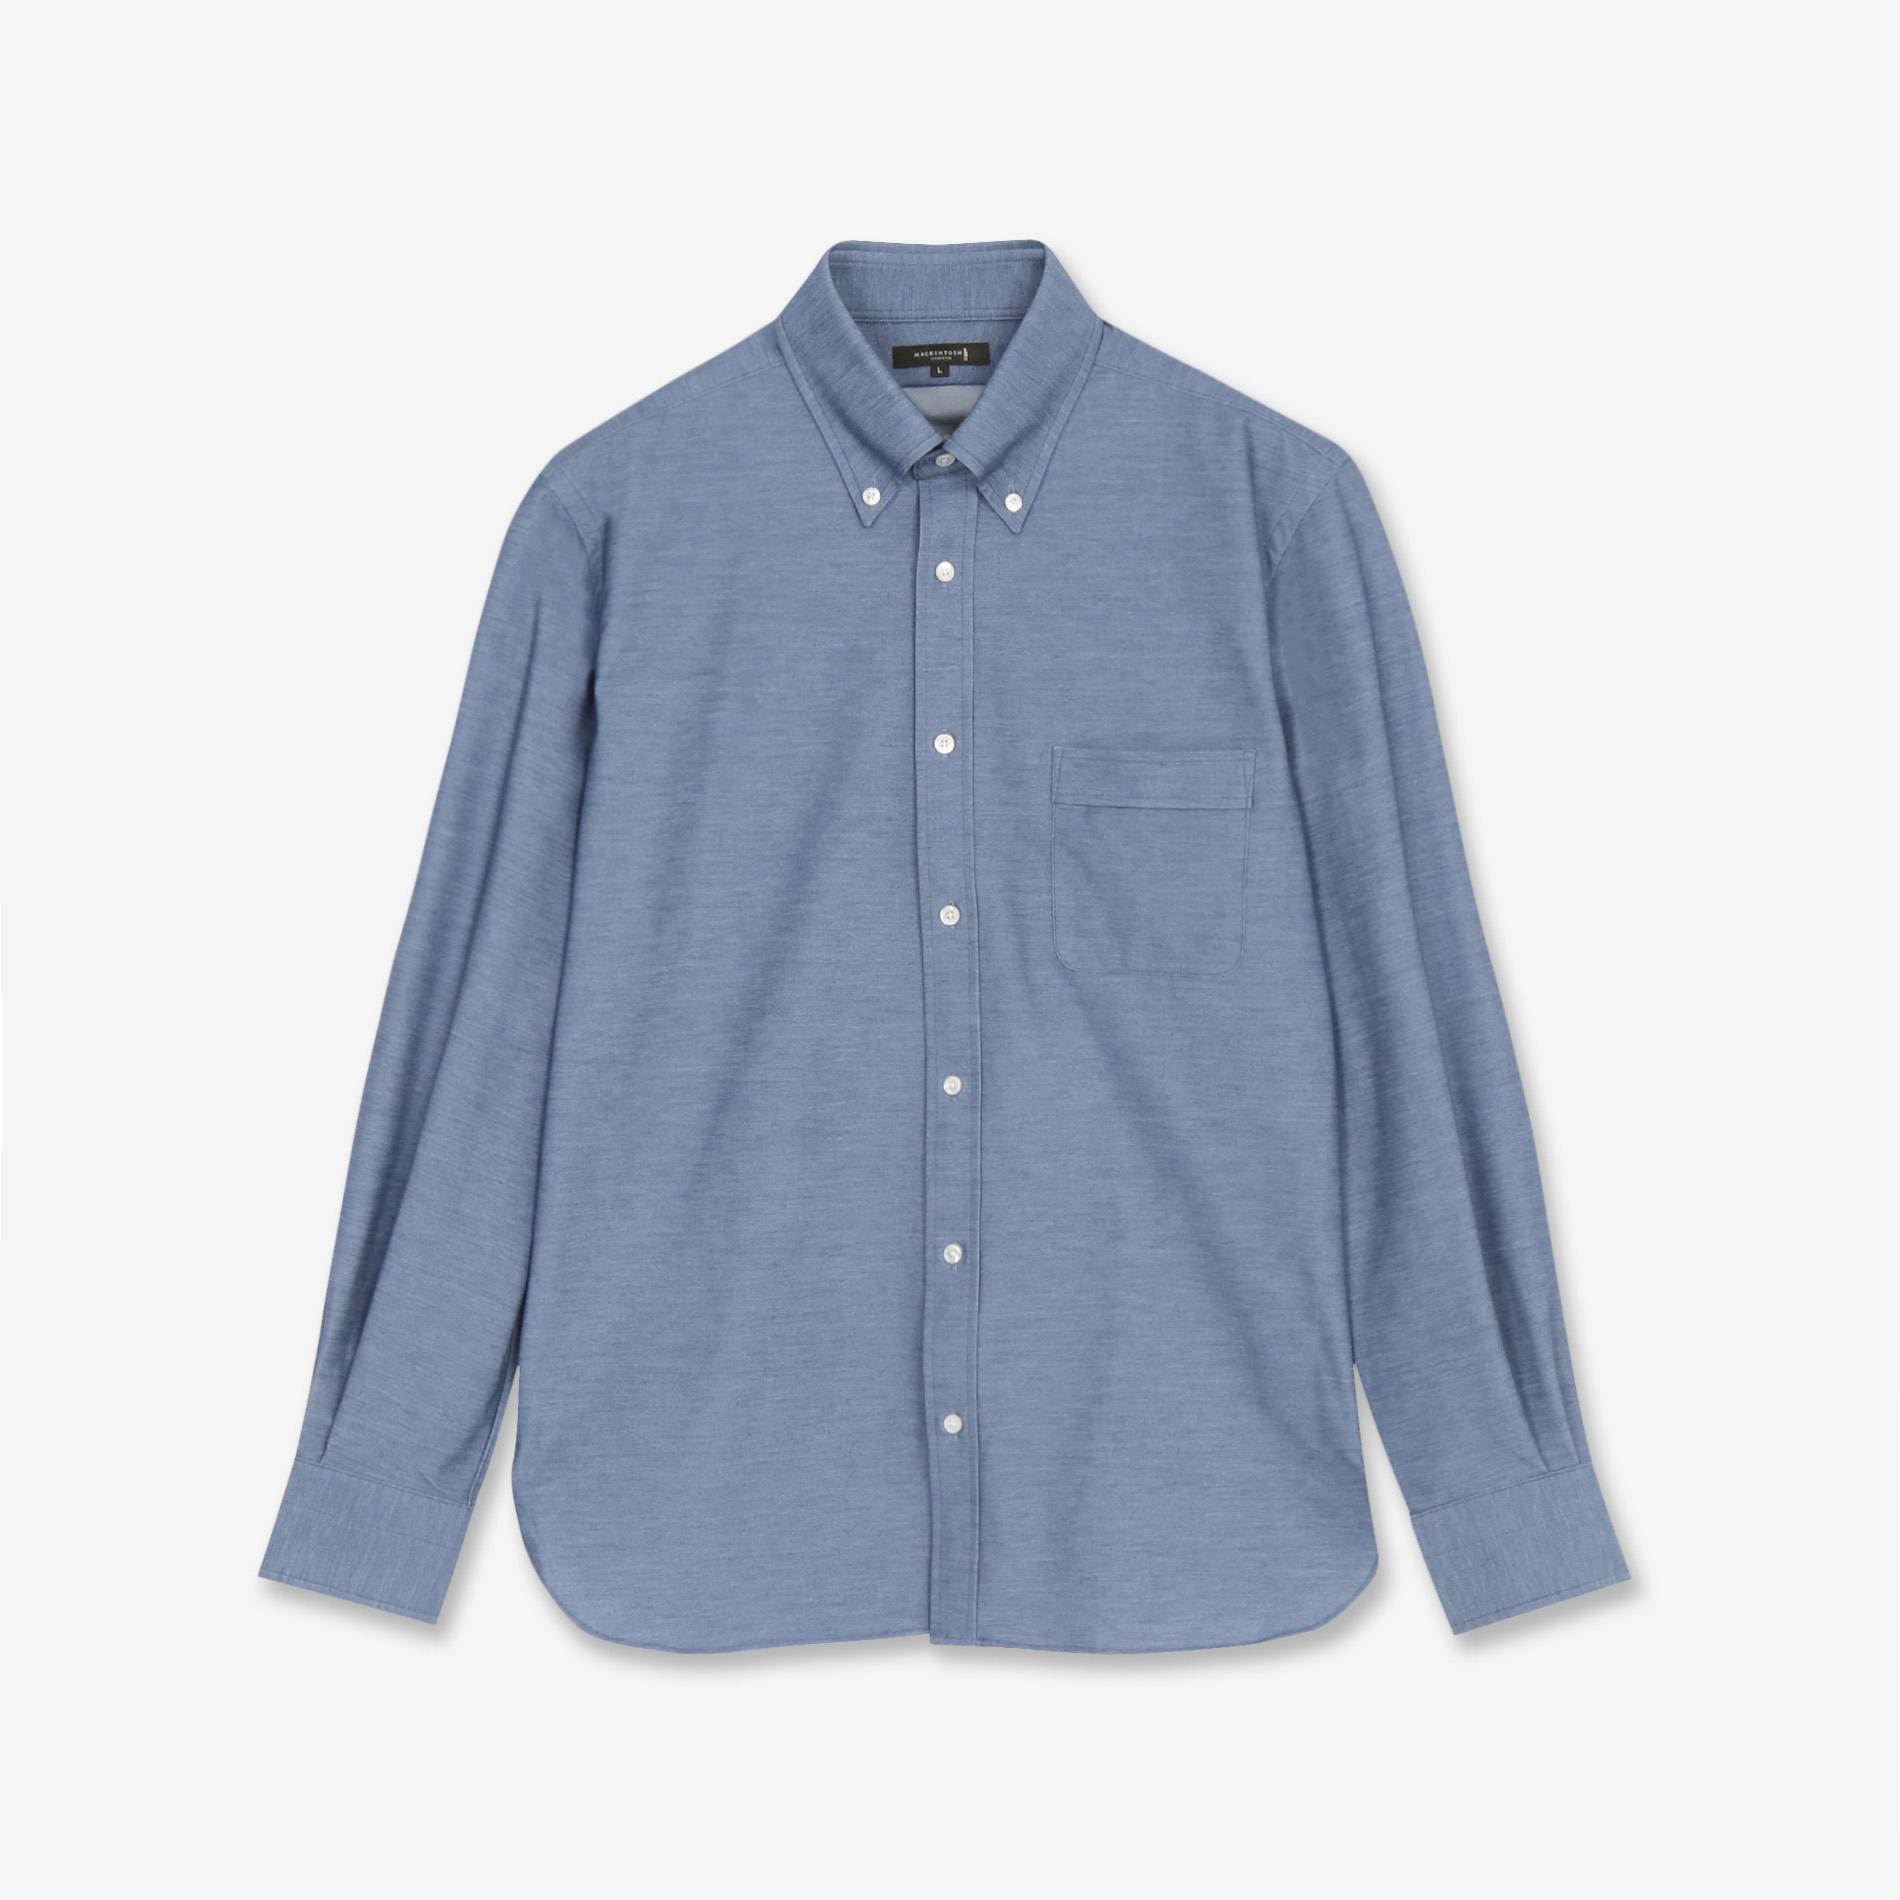 【ALBINI】デニム風ジャージシャツ